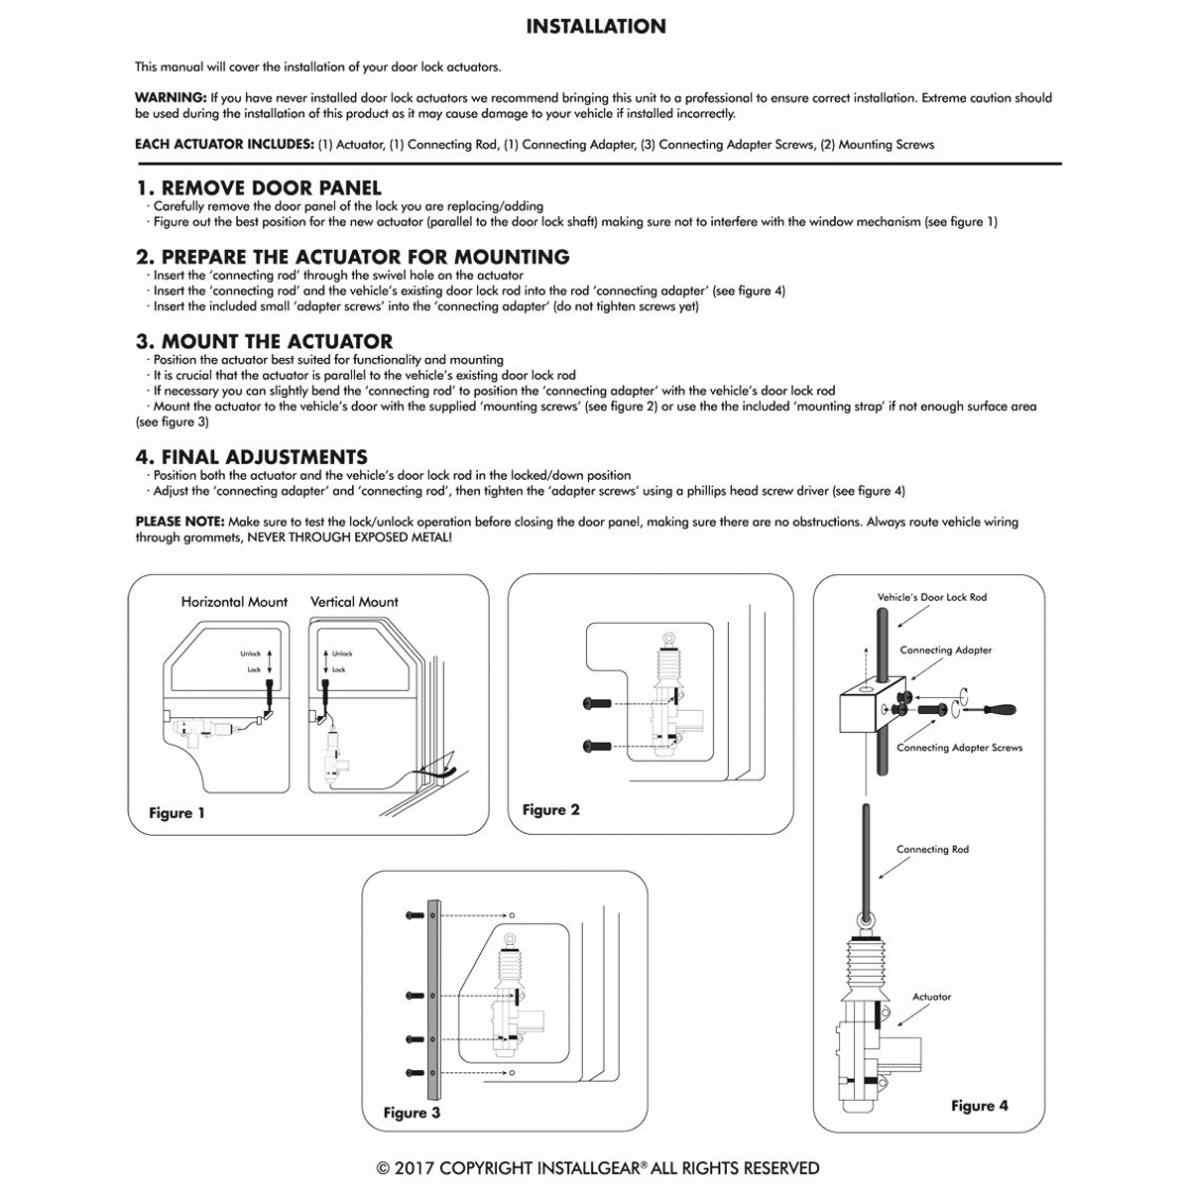 Universal Black 12V 2 Wire Car Auto Truck Heavy Duty Power Door Lock on